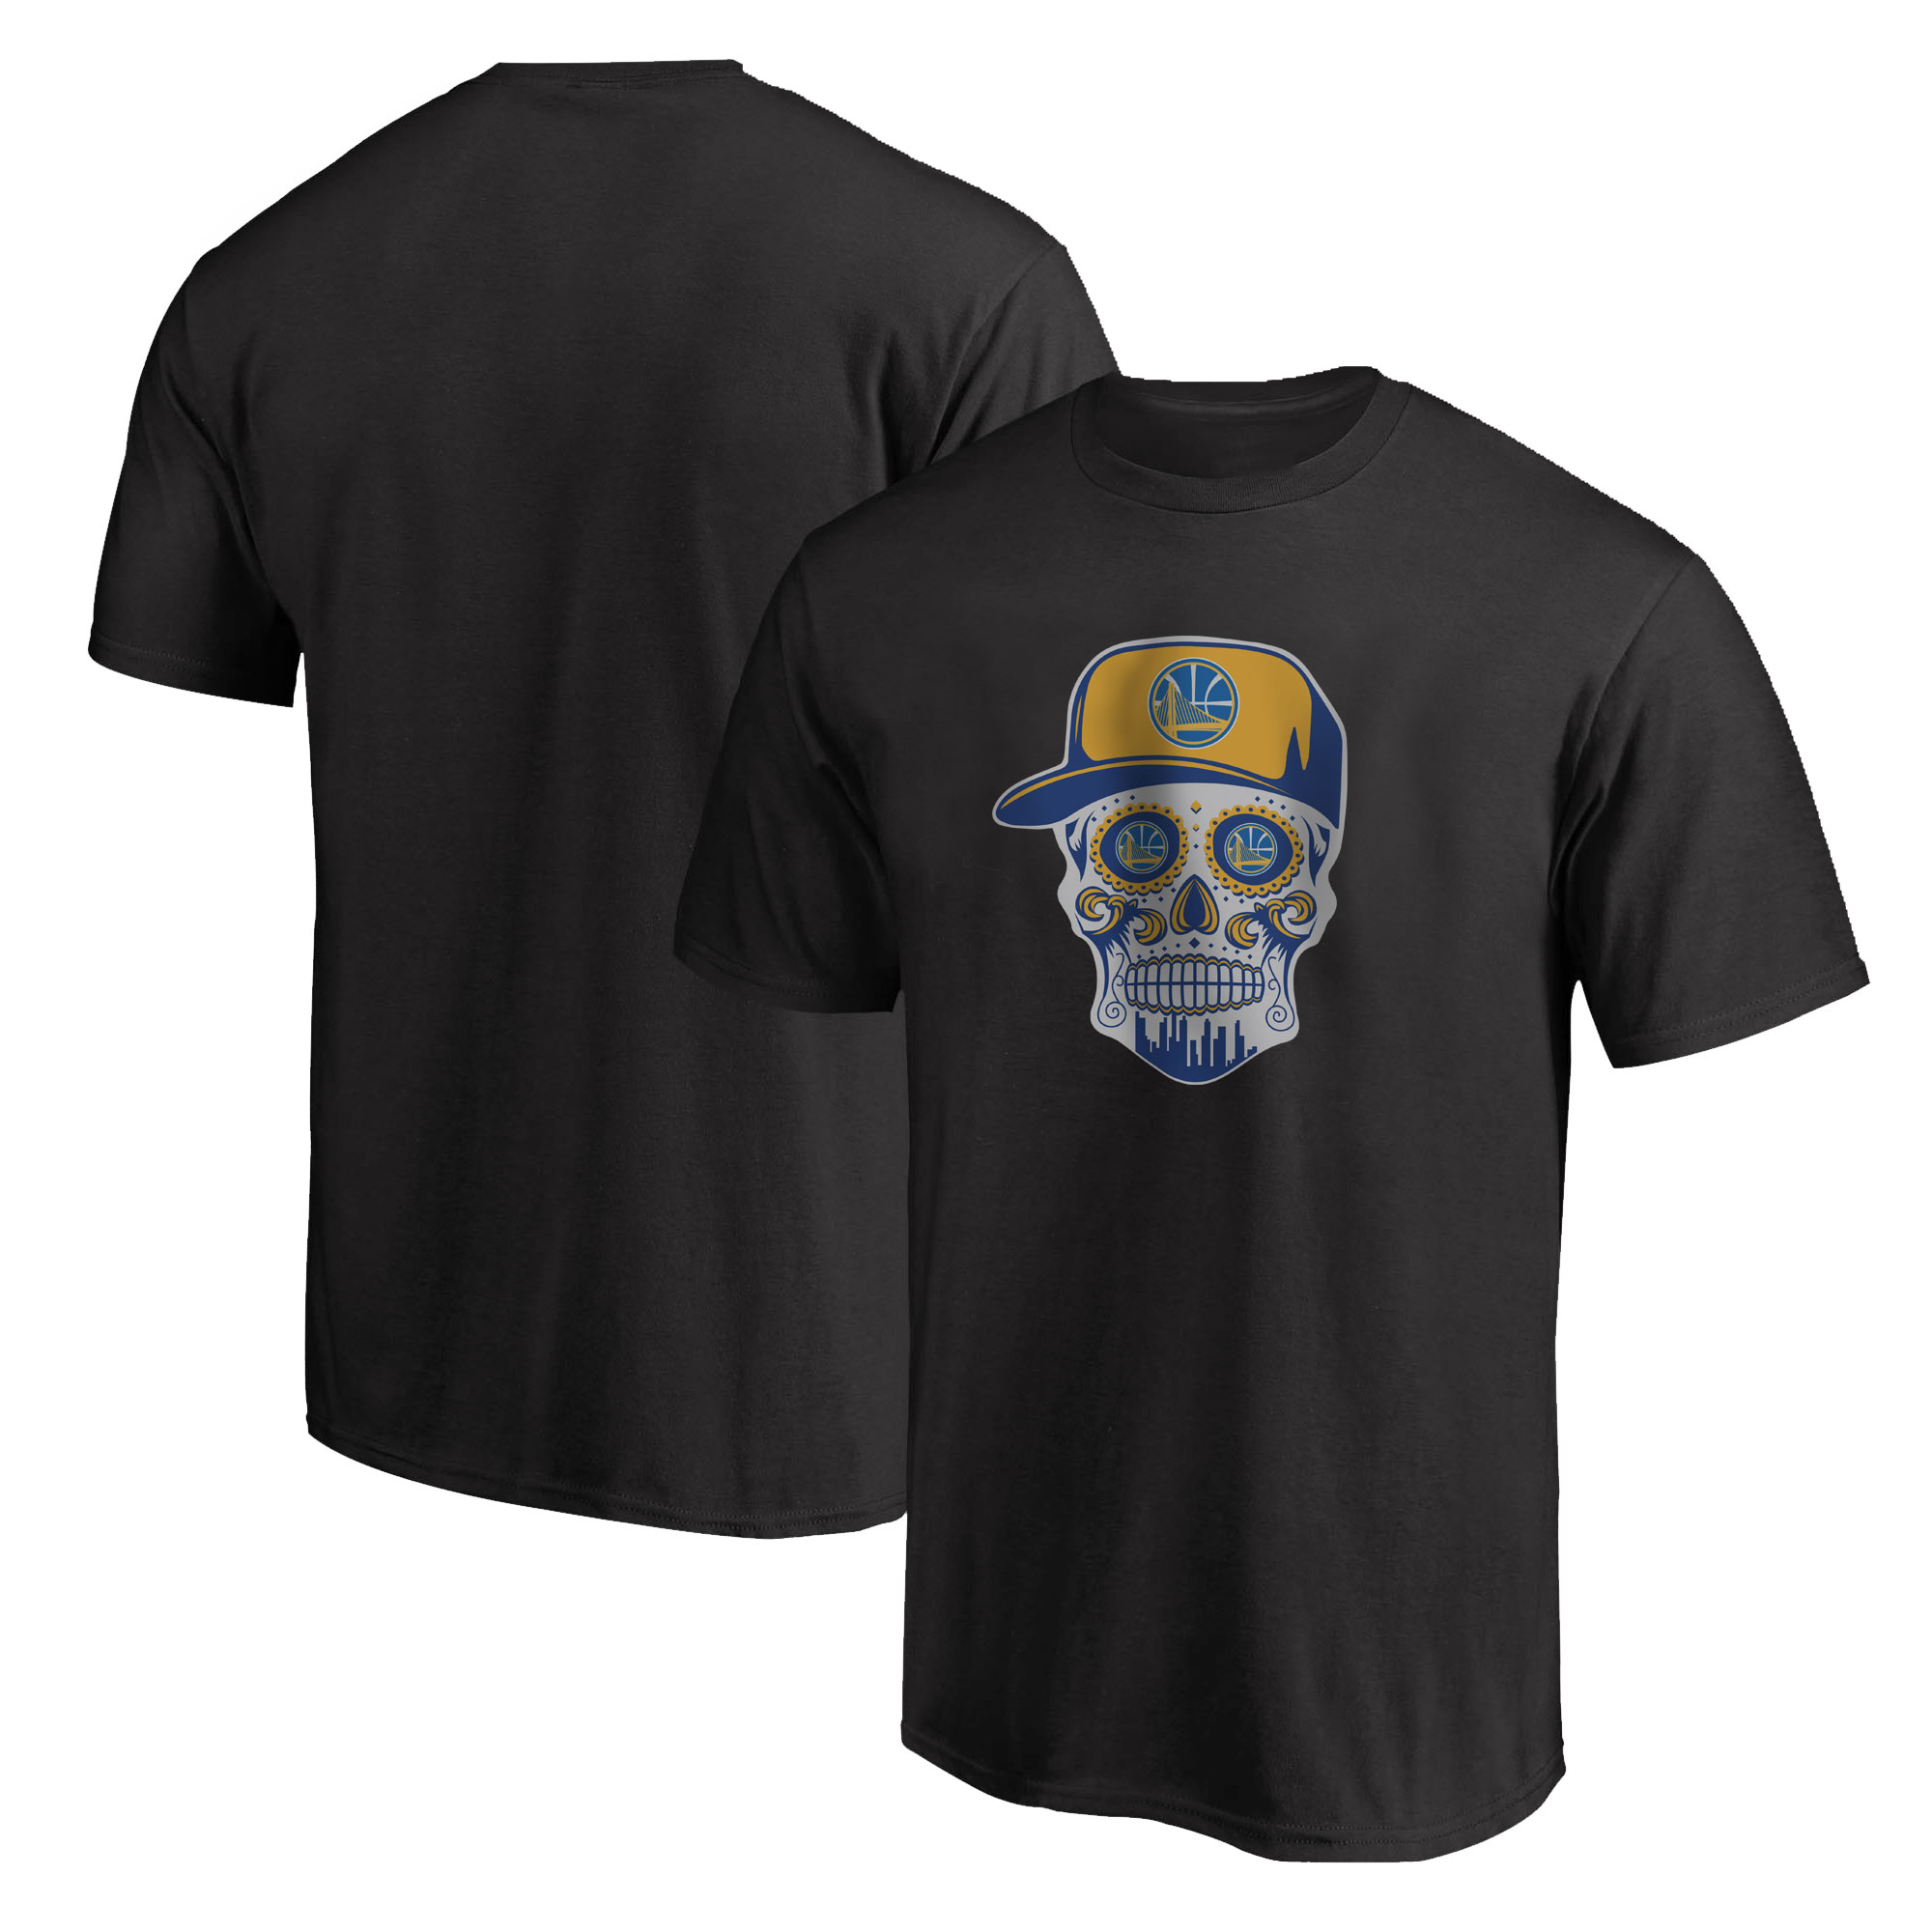 Warriors Skull Tshirt (TSH-BLC-NP-452-NBA-GSW-SKULL)